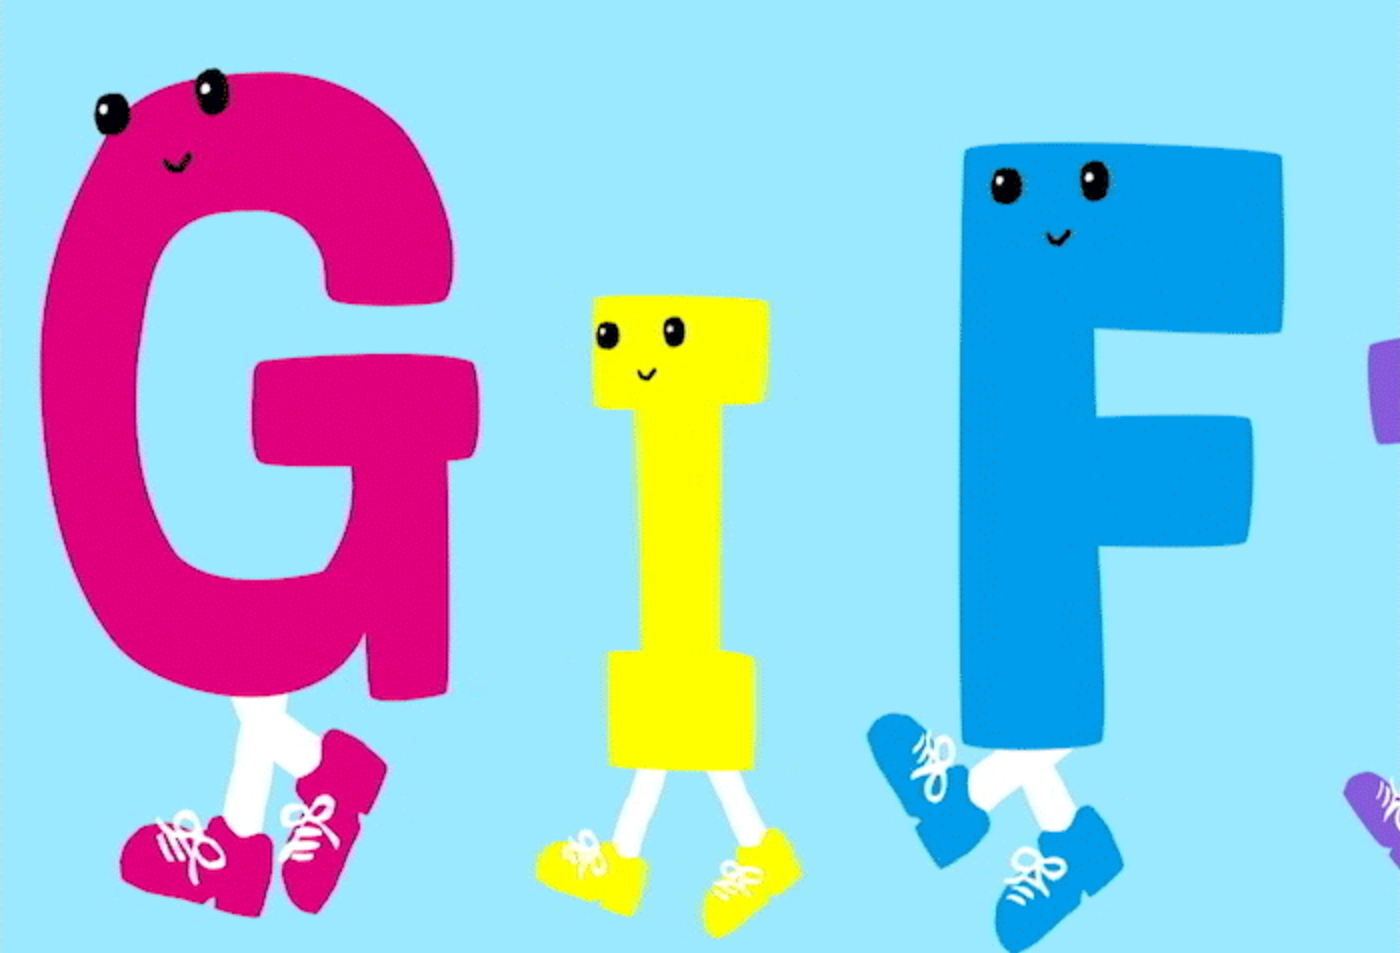 Gifアニメ制作サービス開始facebooktwitter運営のアクセントに